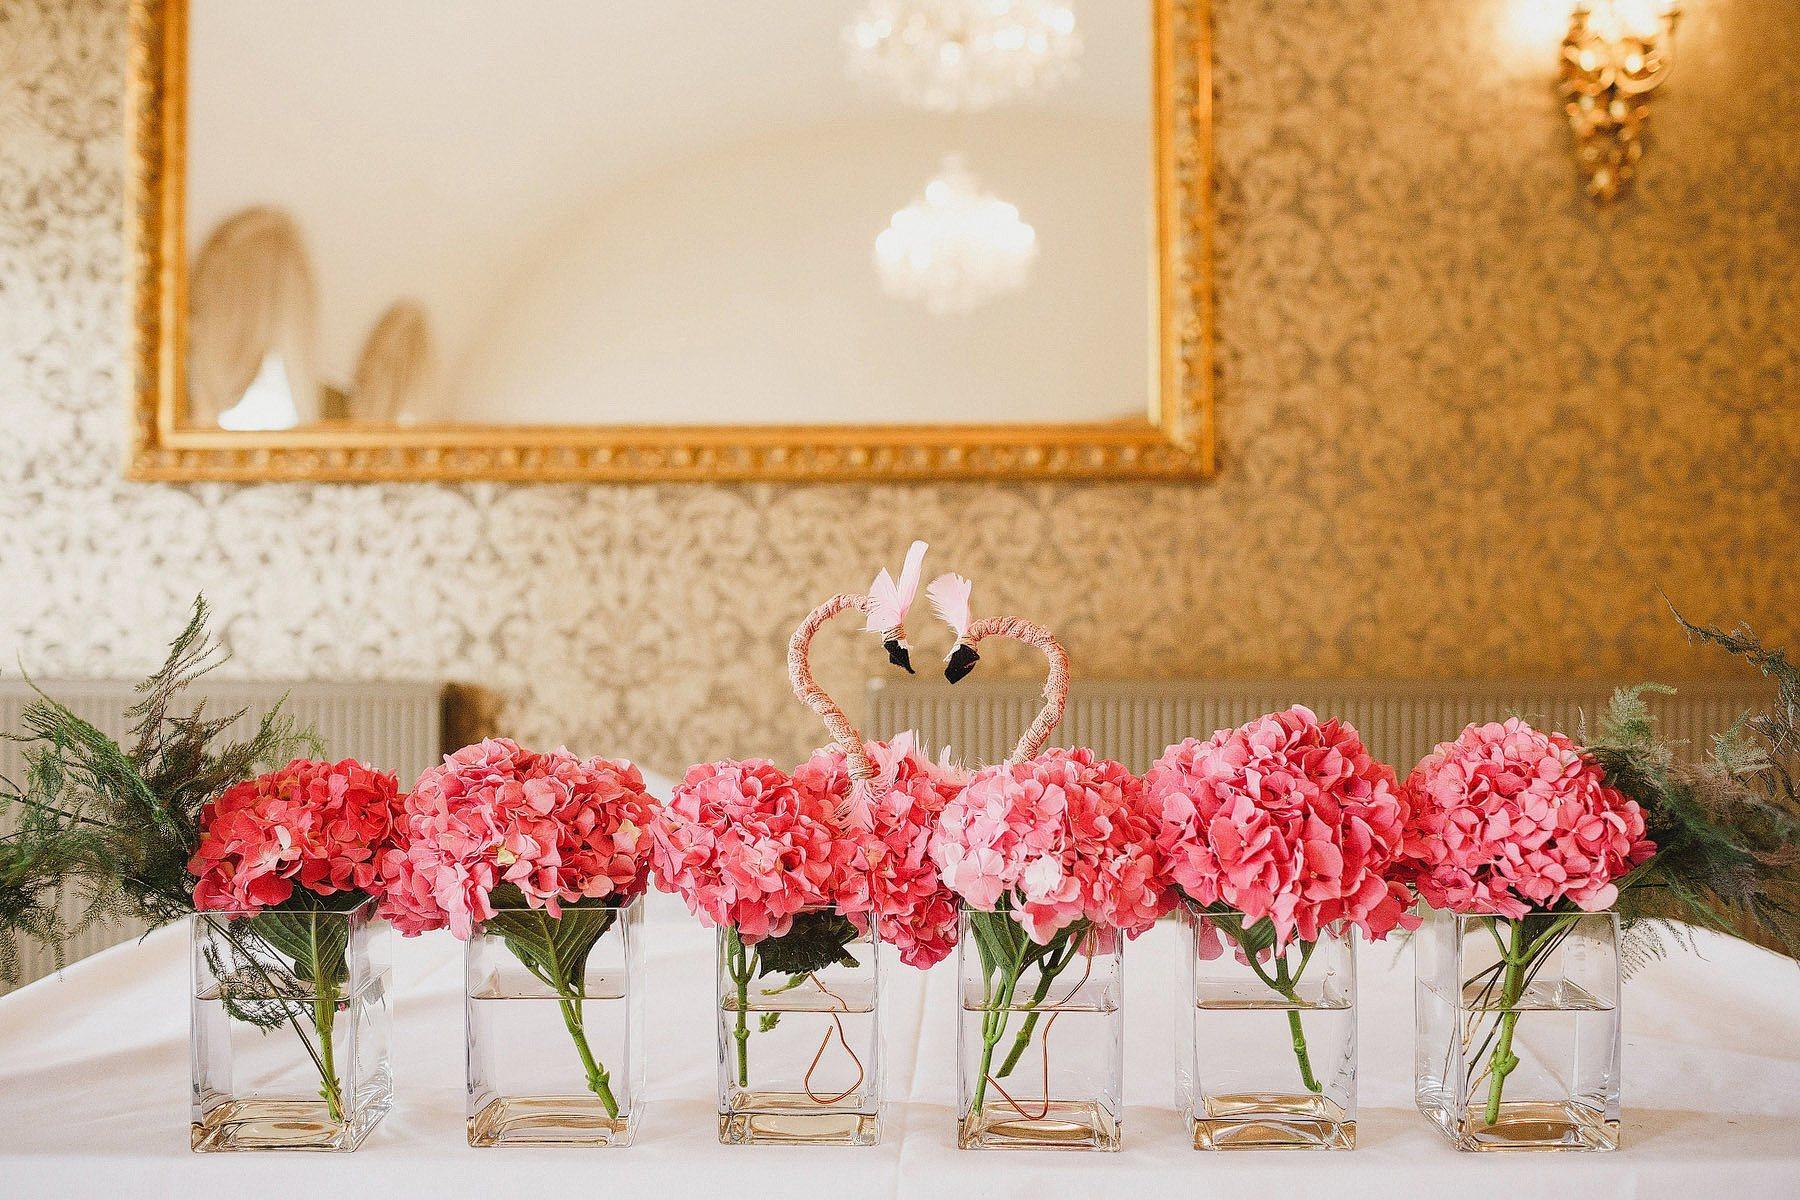 flamingo flowers at a wedding